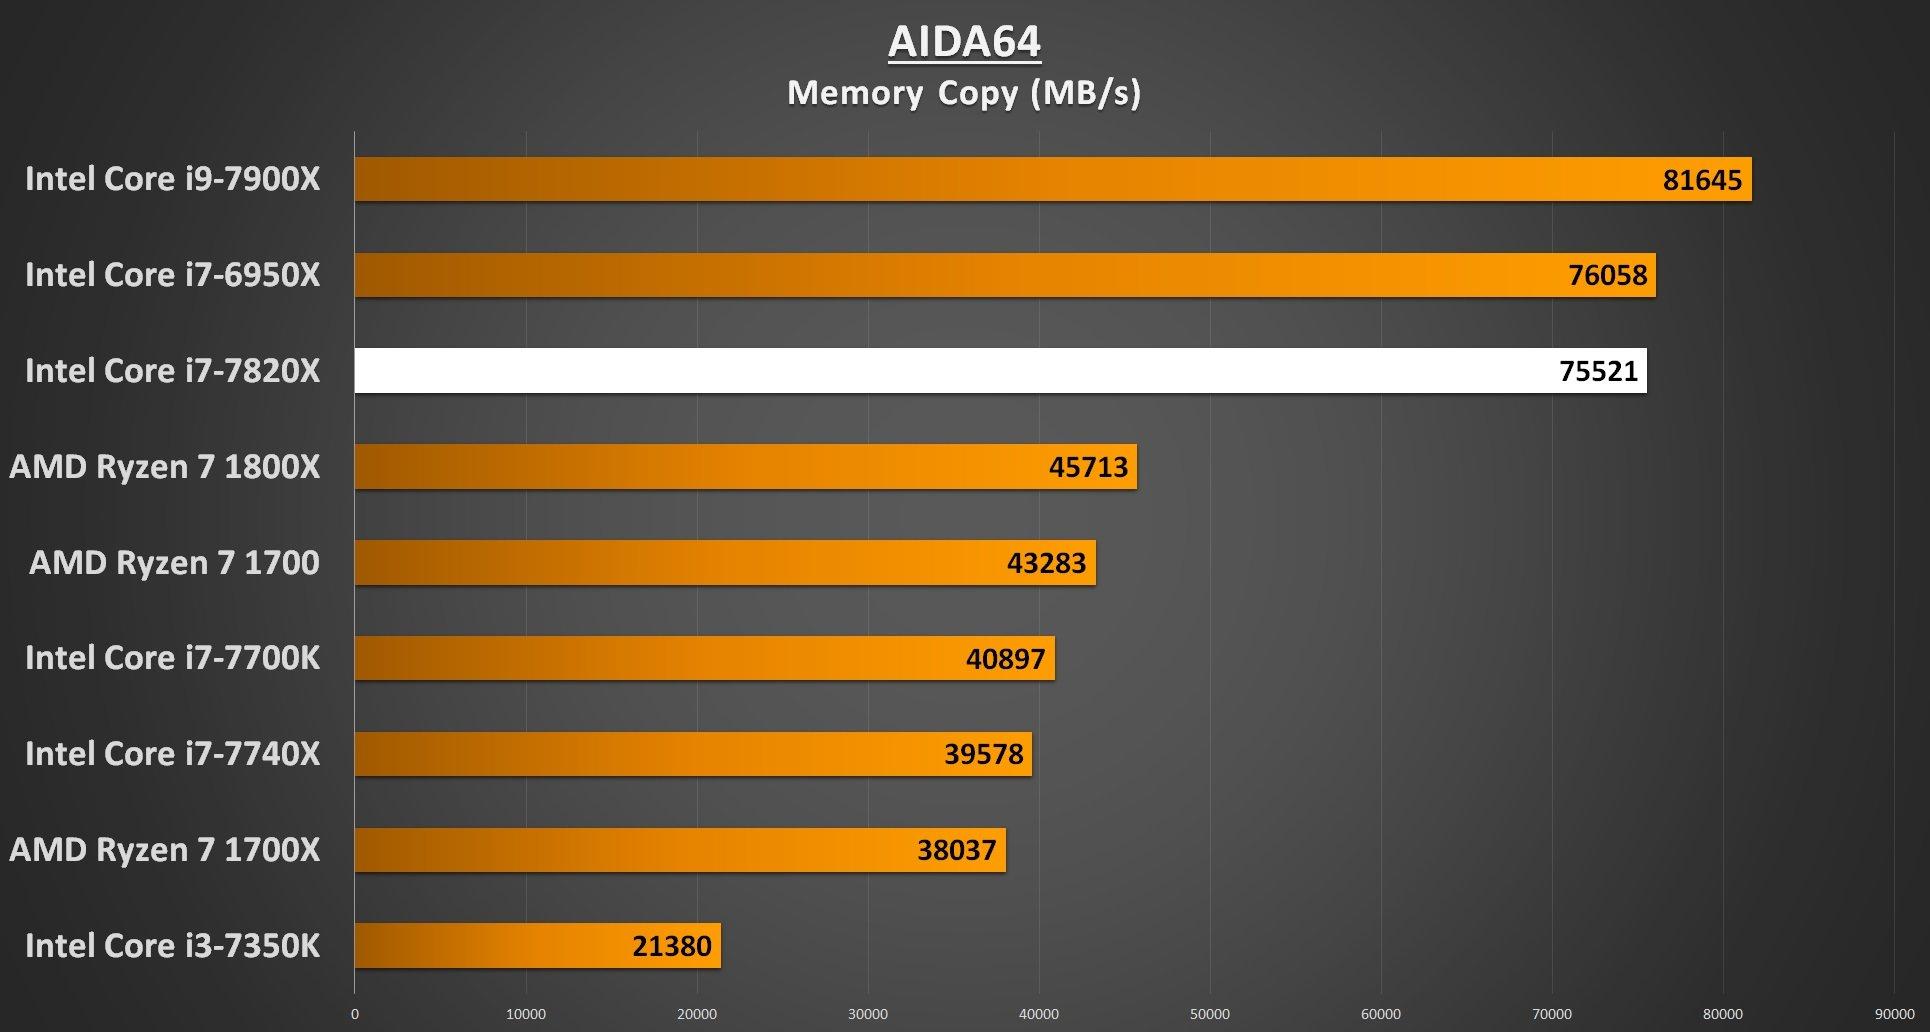 AIDA64 Memory Copy - i7-7820X Performance